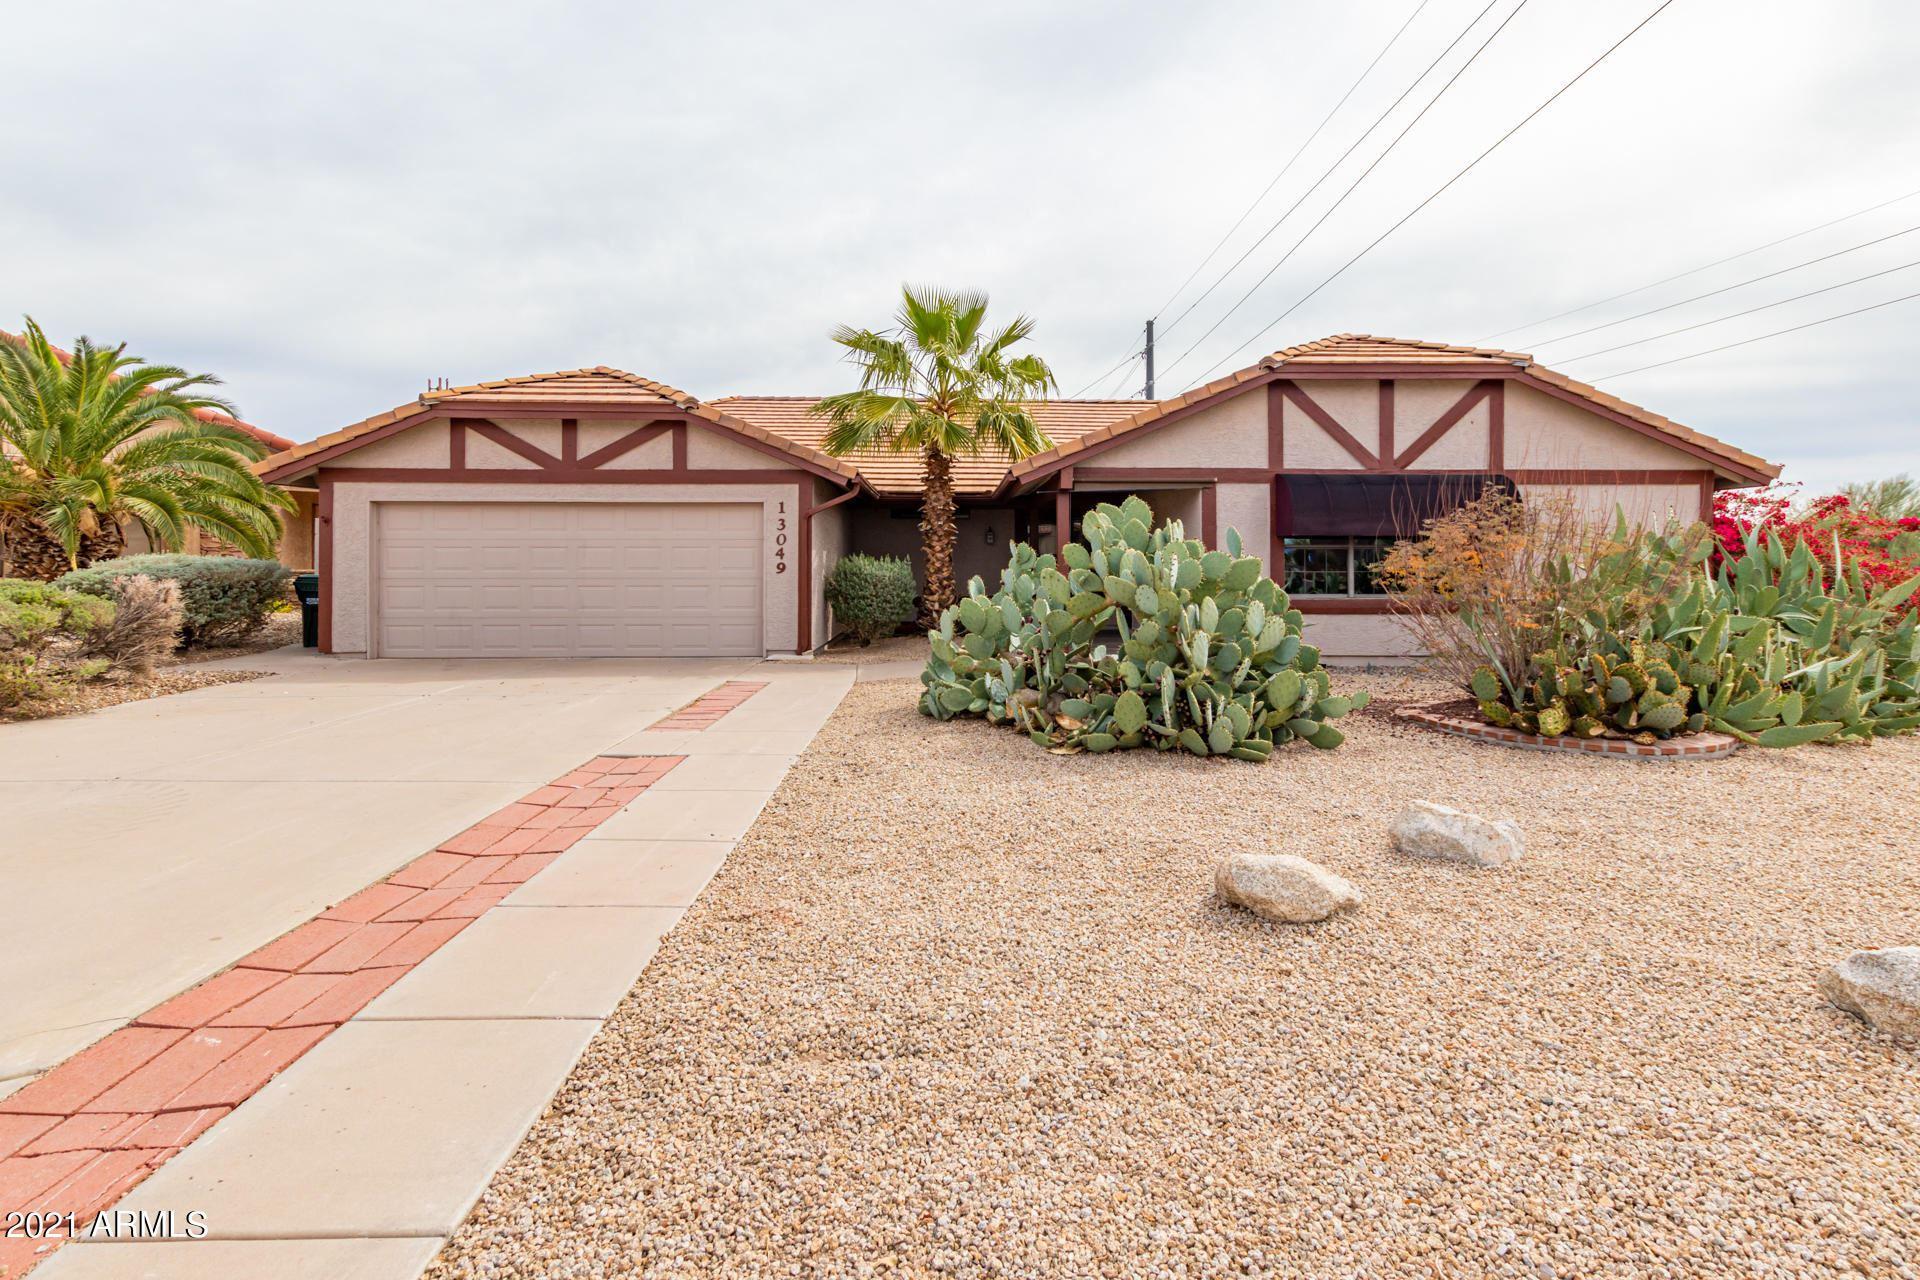 13049 S 43RD Street, Phoenix, AZ 85044 - MLS#: 6208131